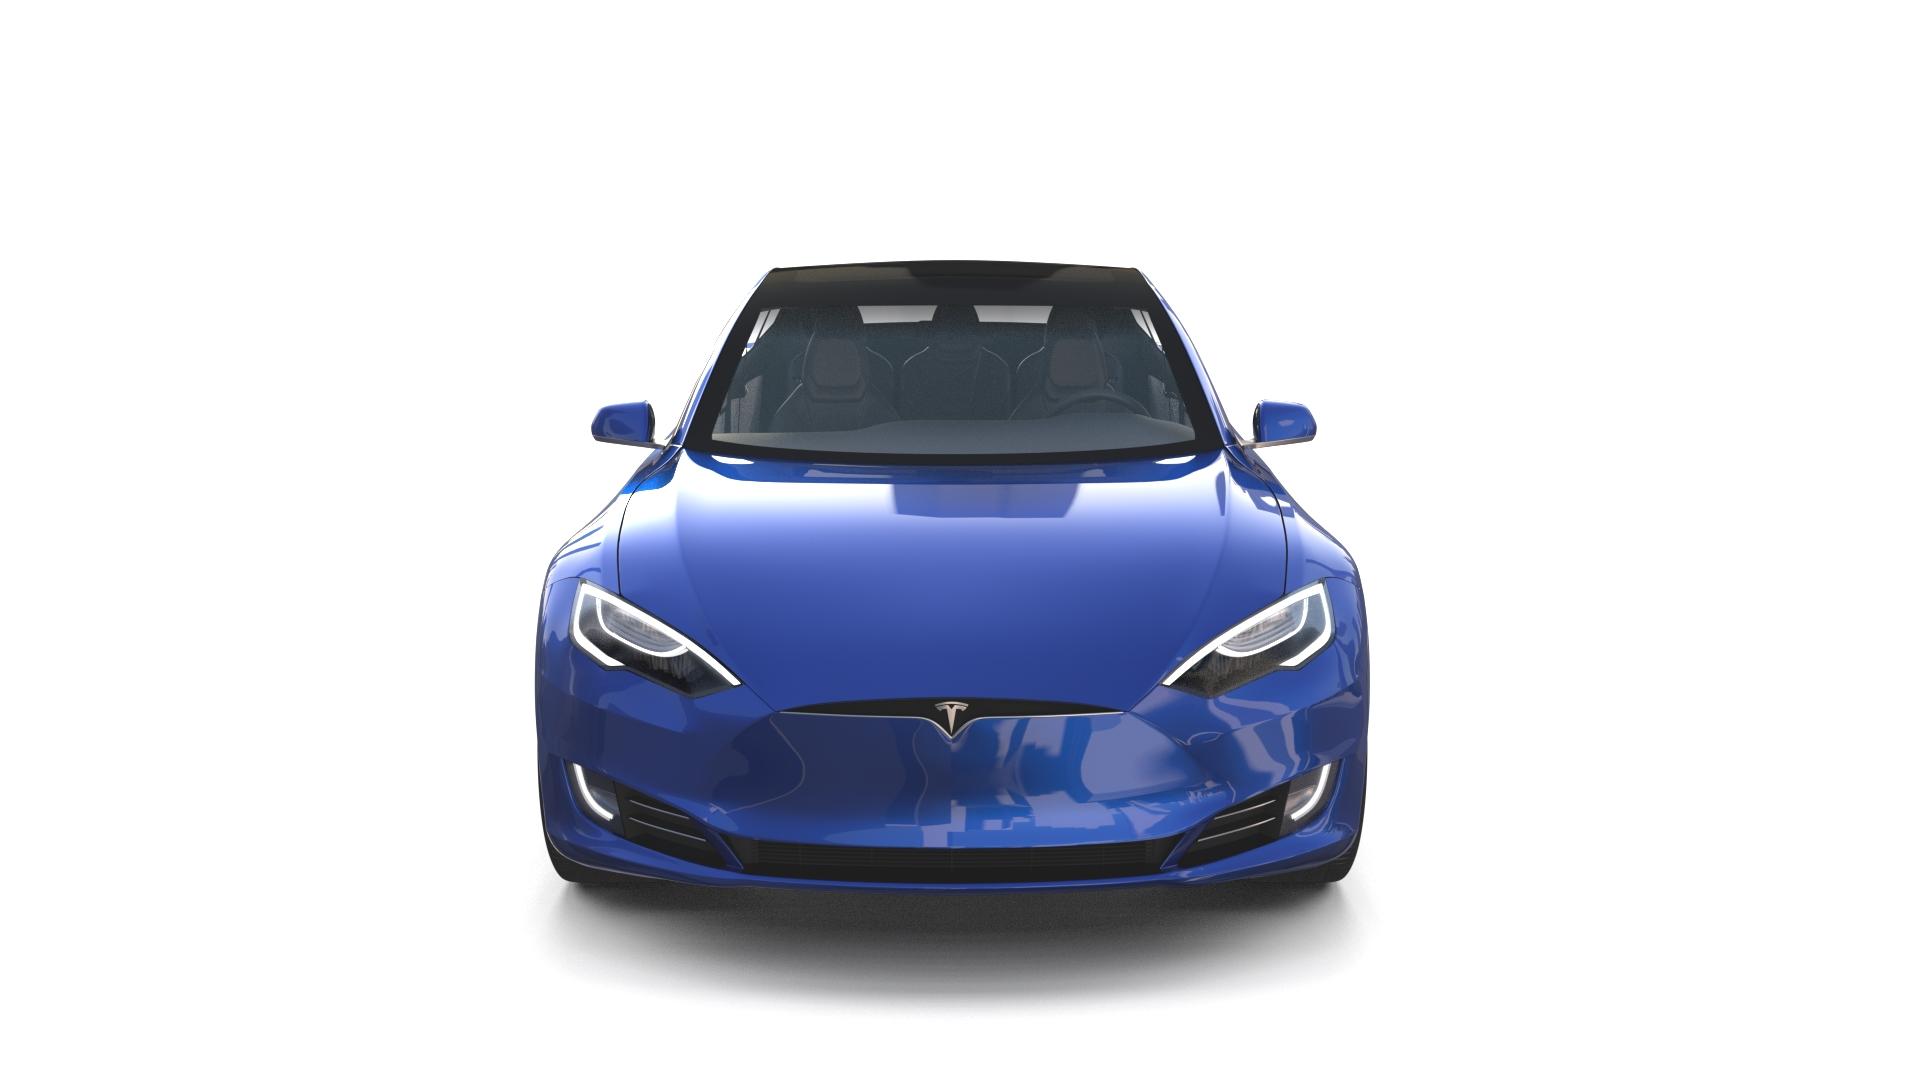 Tesla Model S 2016 Blue with interior